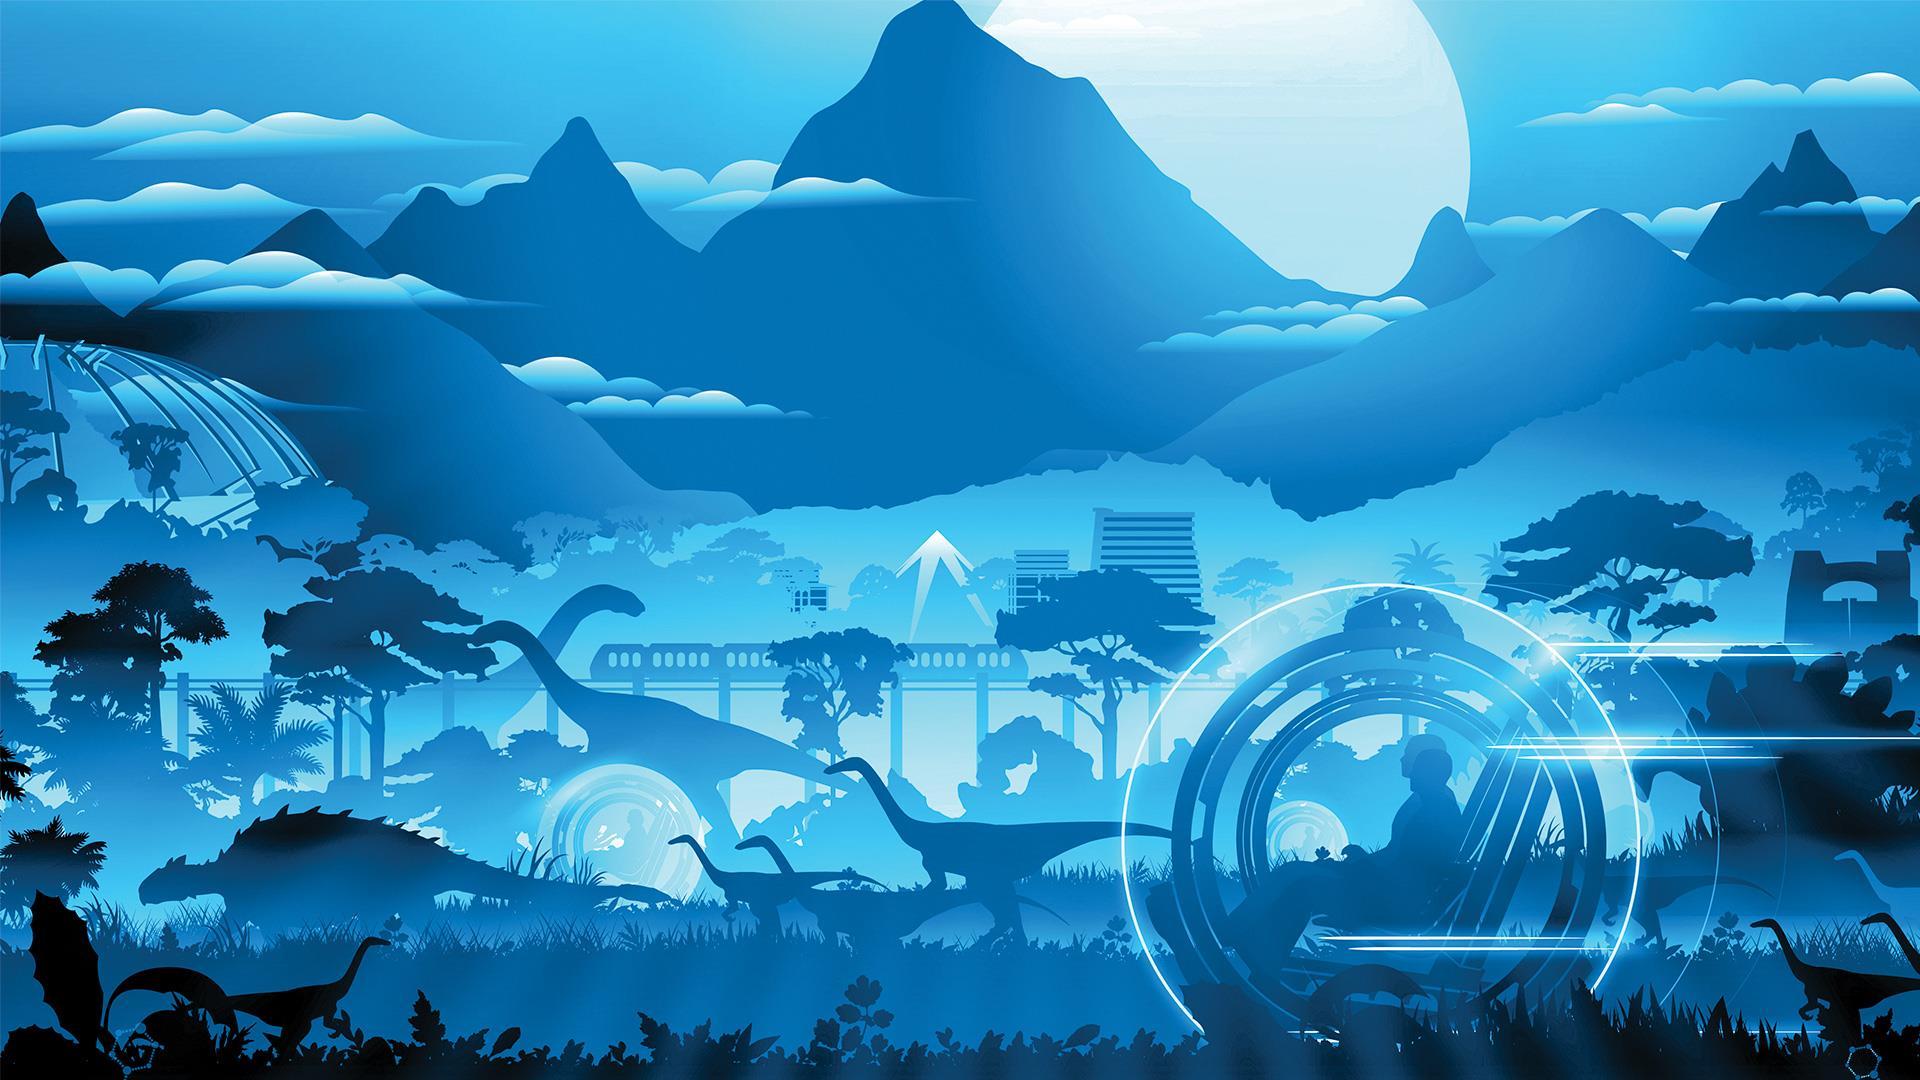 Jurassic world full hd fond d 39 cran and arri re plan 1920x1080 id 609823 - Telecharger jurassic park 4 ...